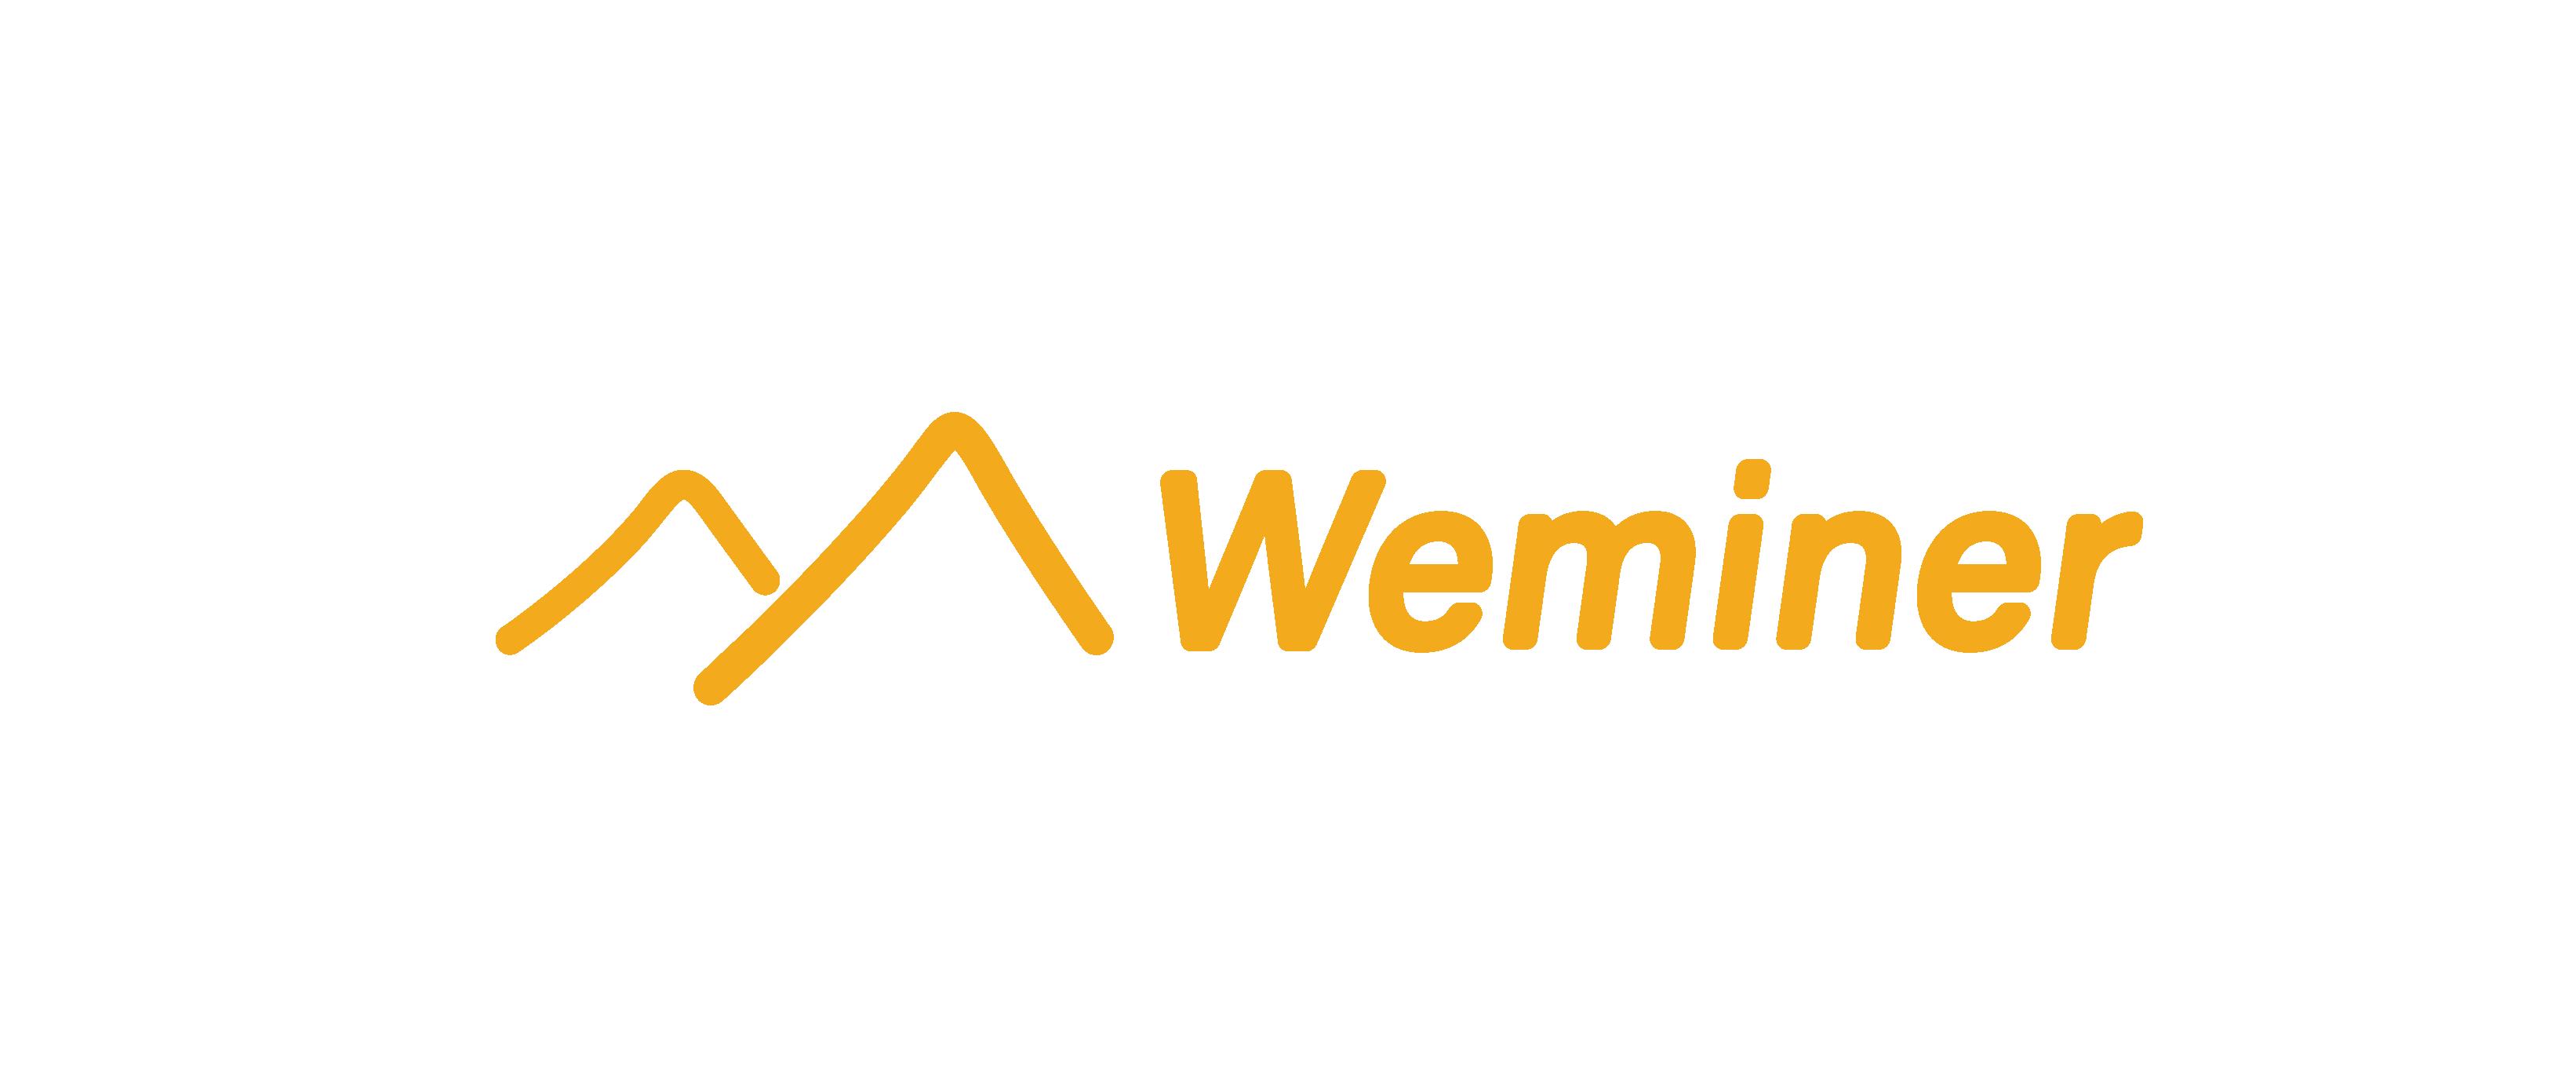 Weminer微矿场